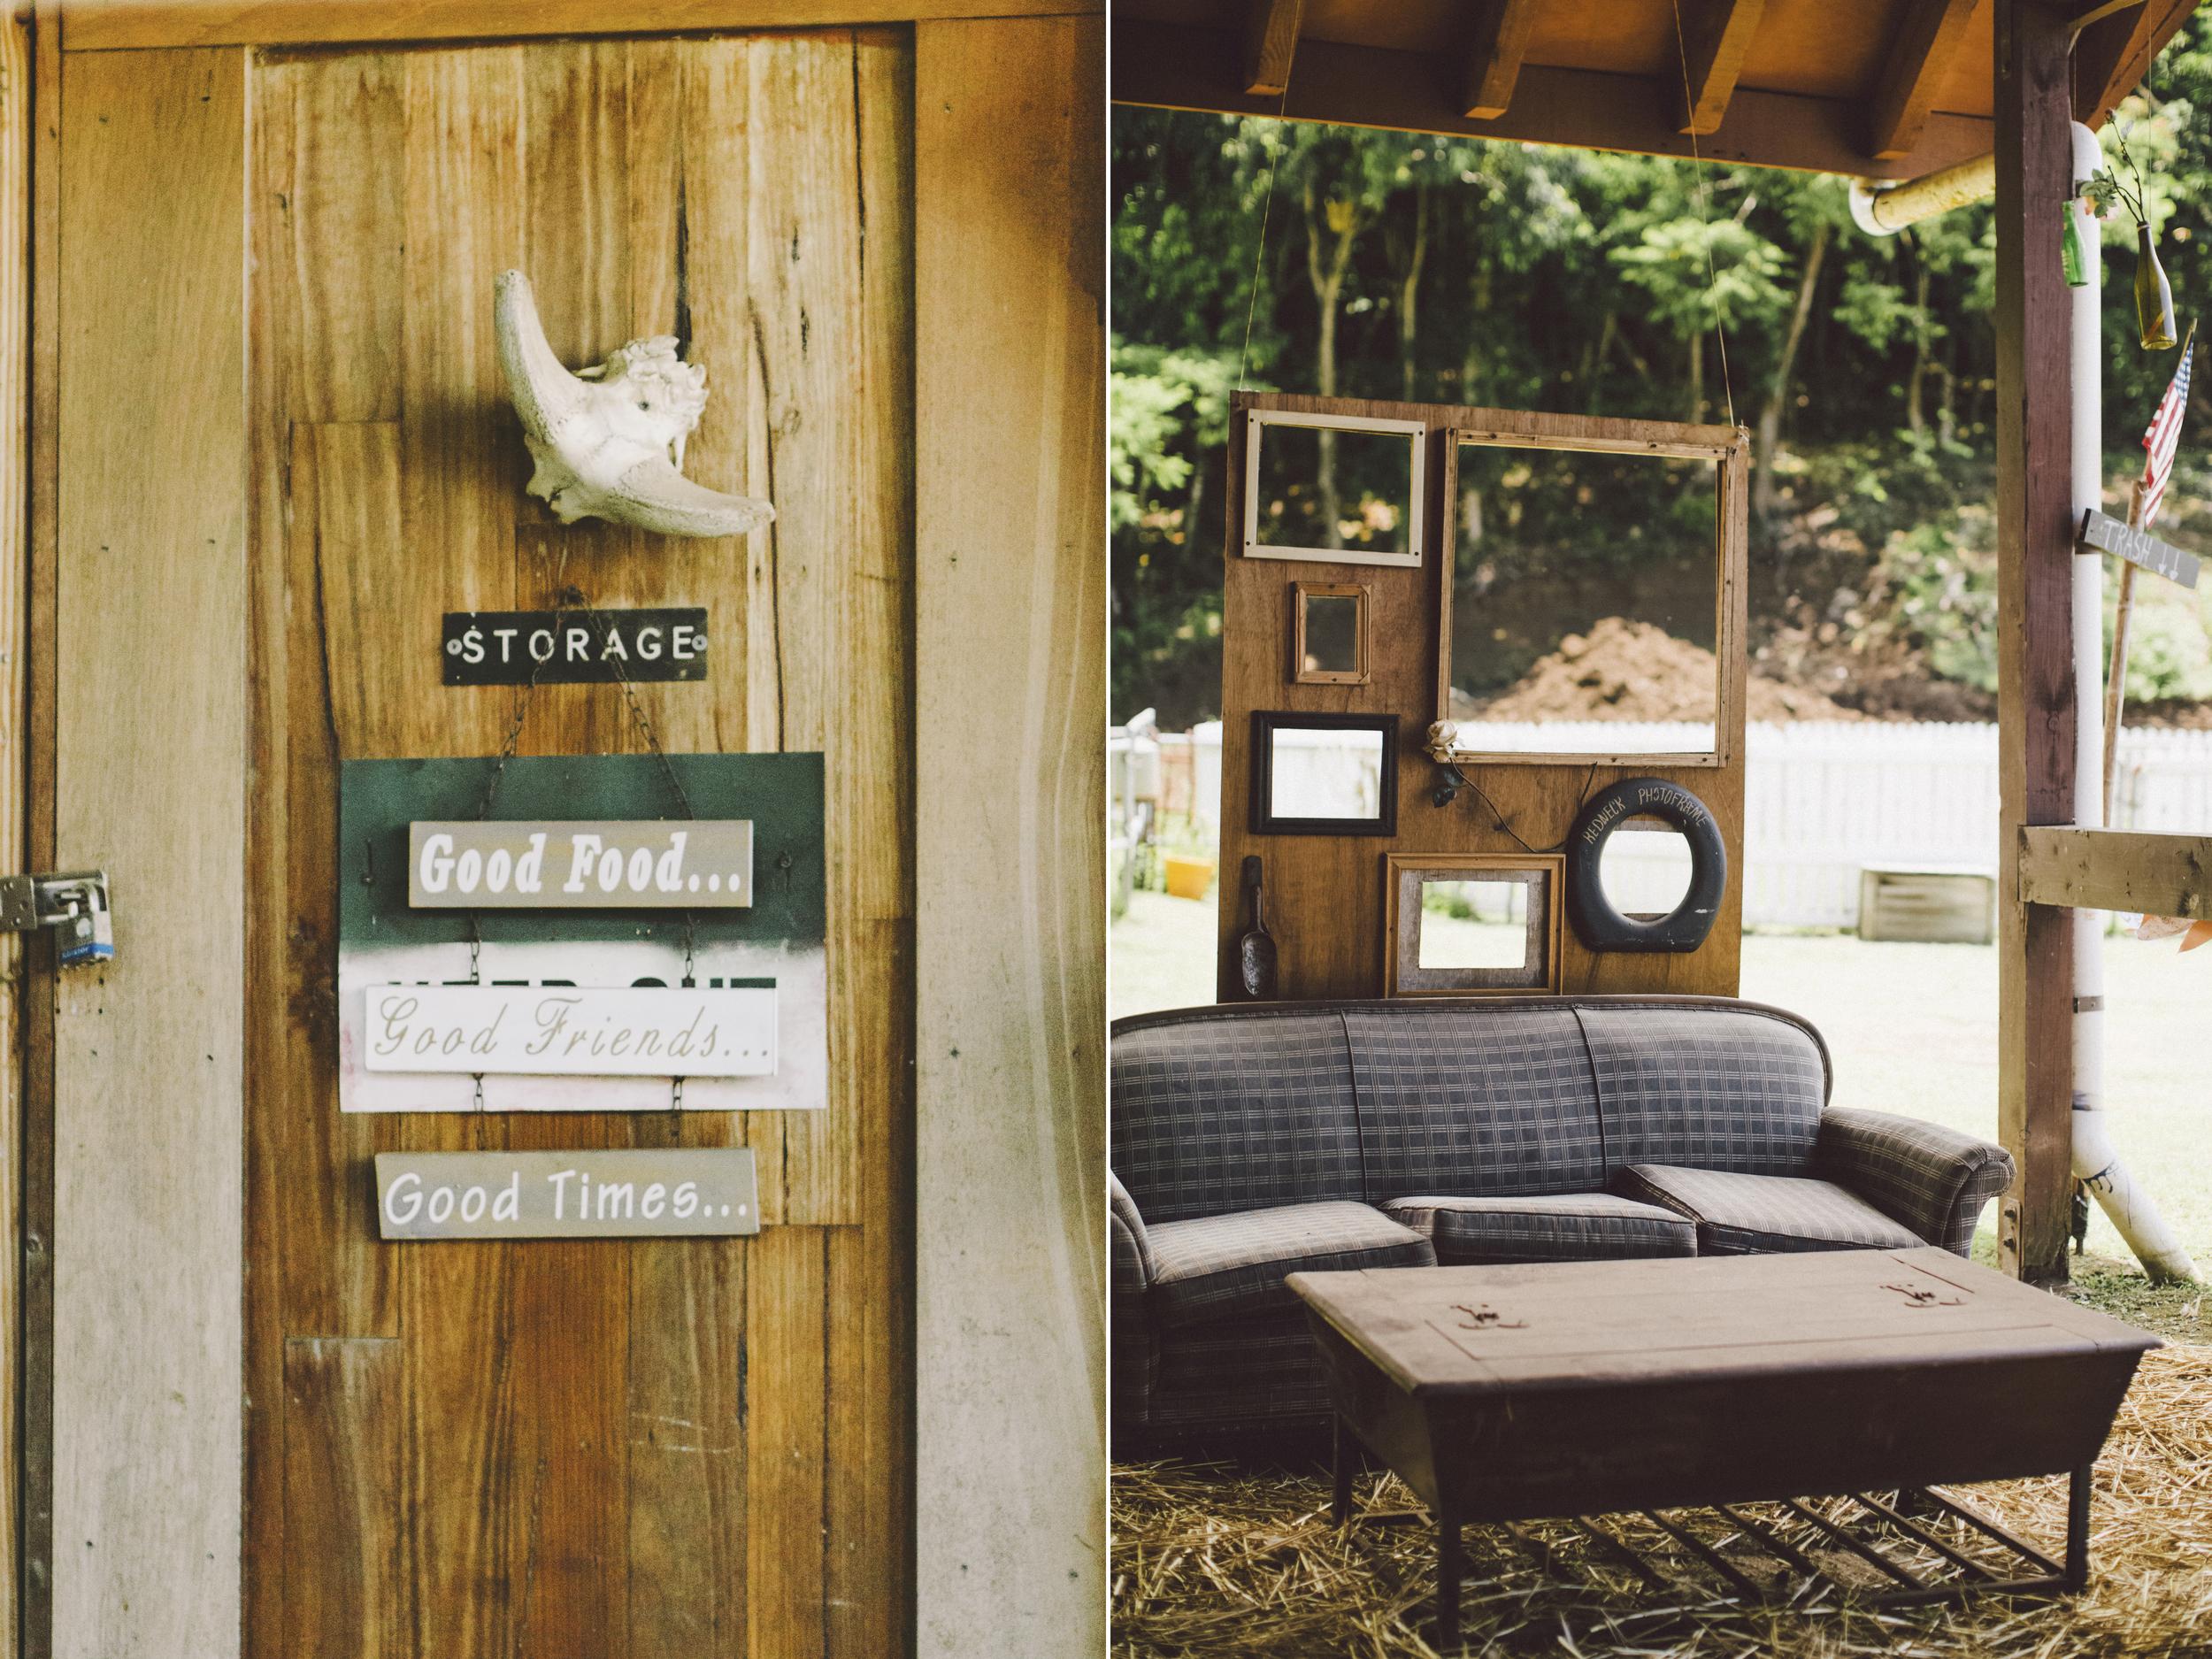 angie-diaz-photography-oahu-hawaii-wedding-tradewinds-ranch-89.jpg